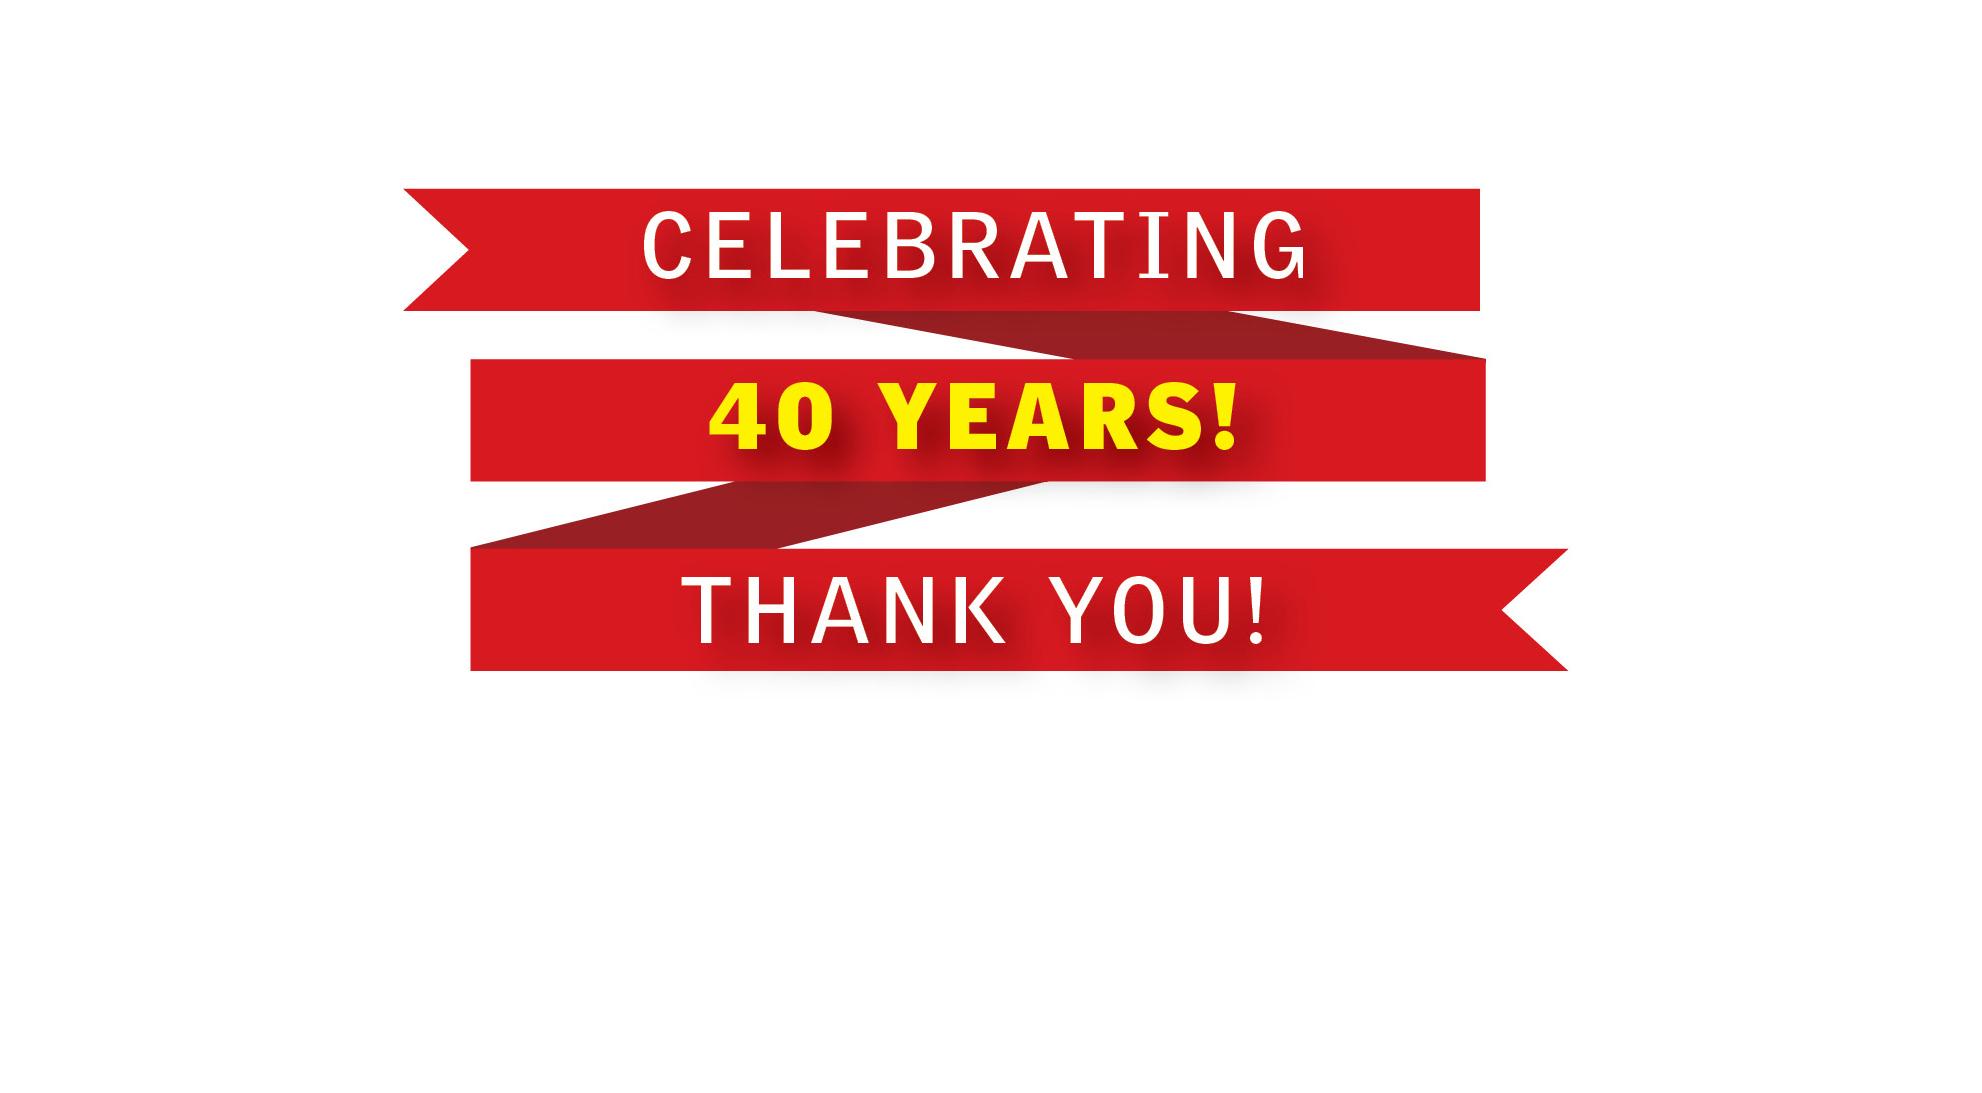 ATG-40 years.jpg